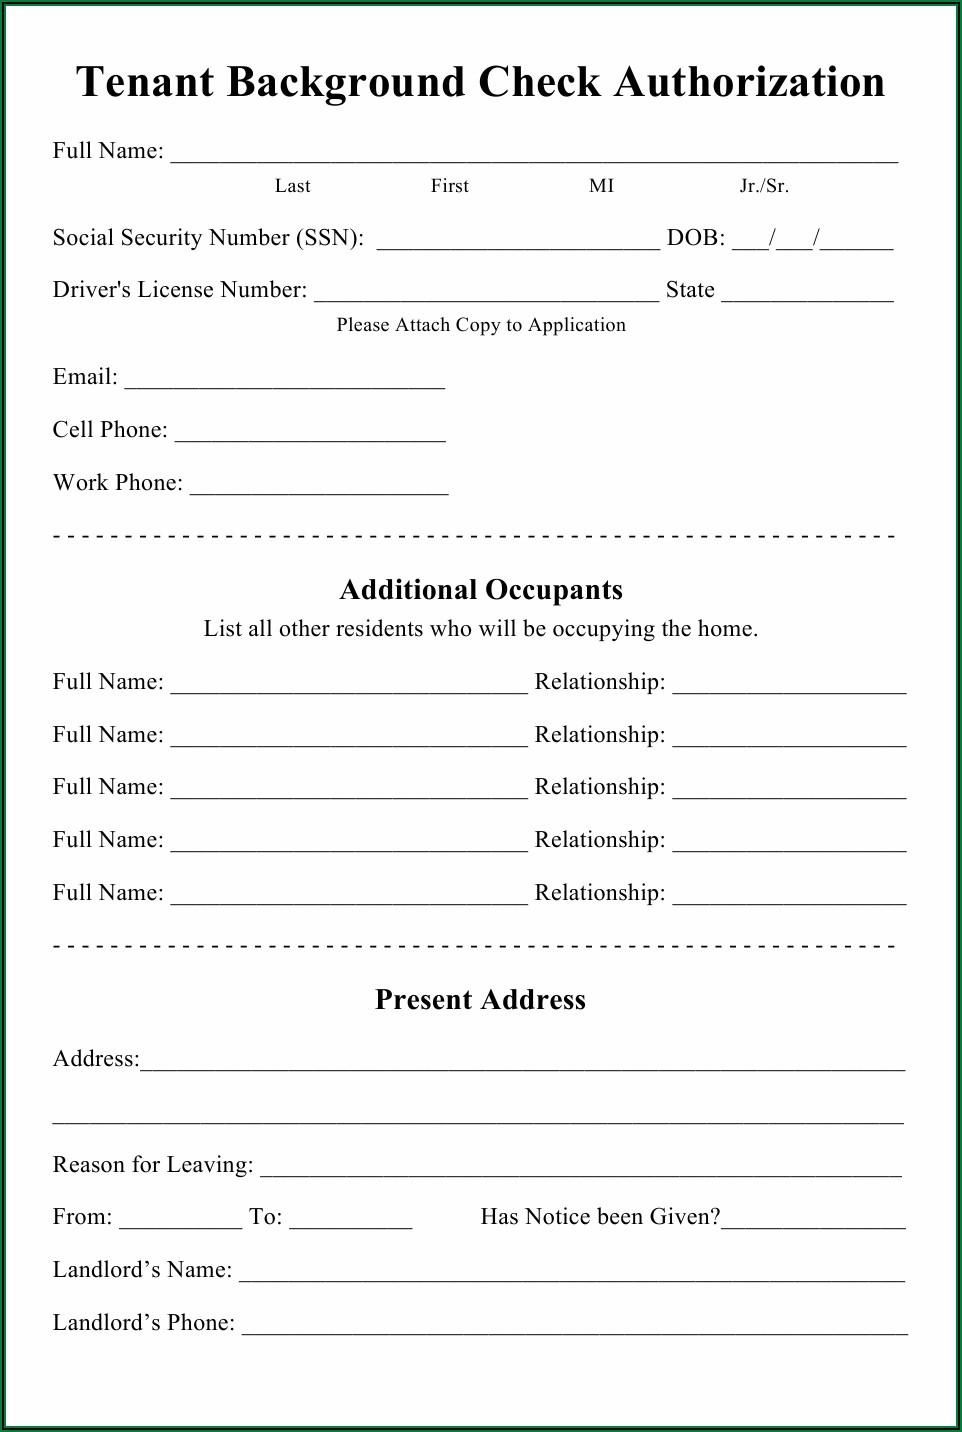 Tenant Background Check Form Pdf